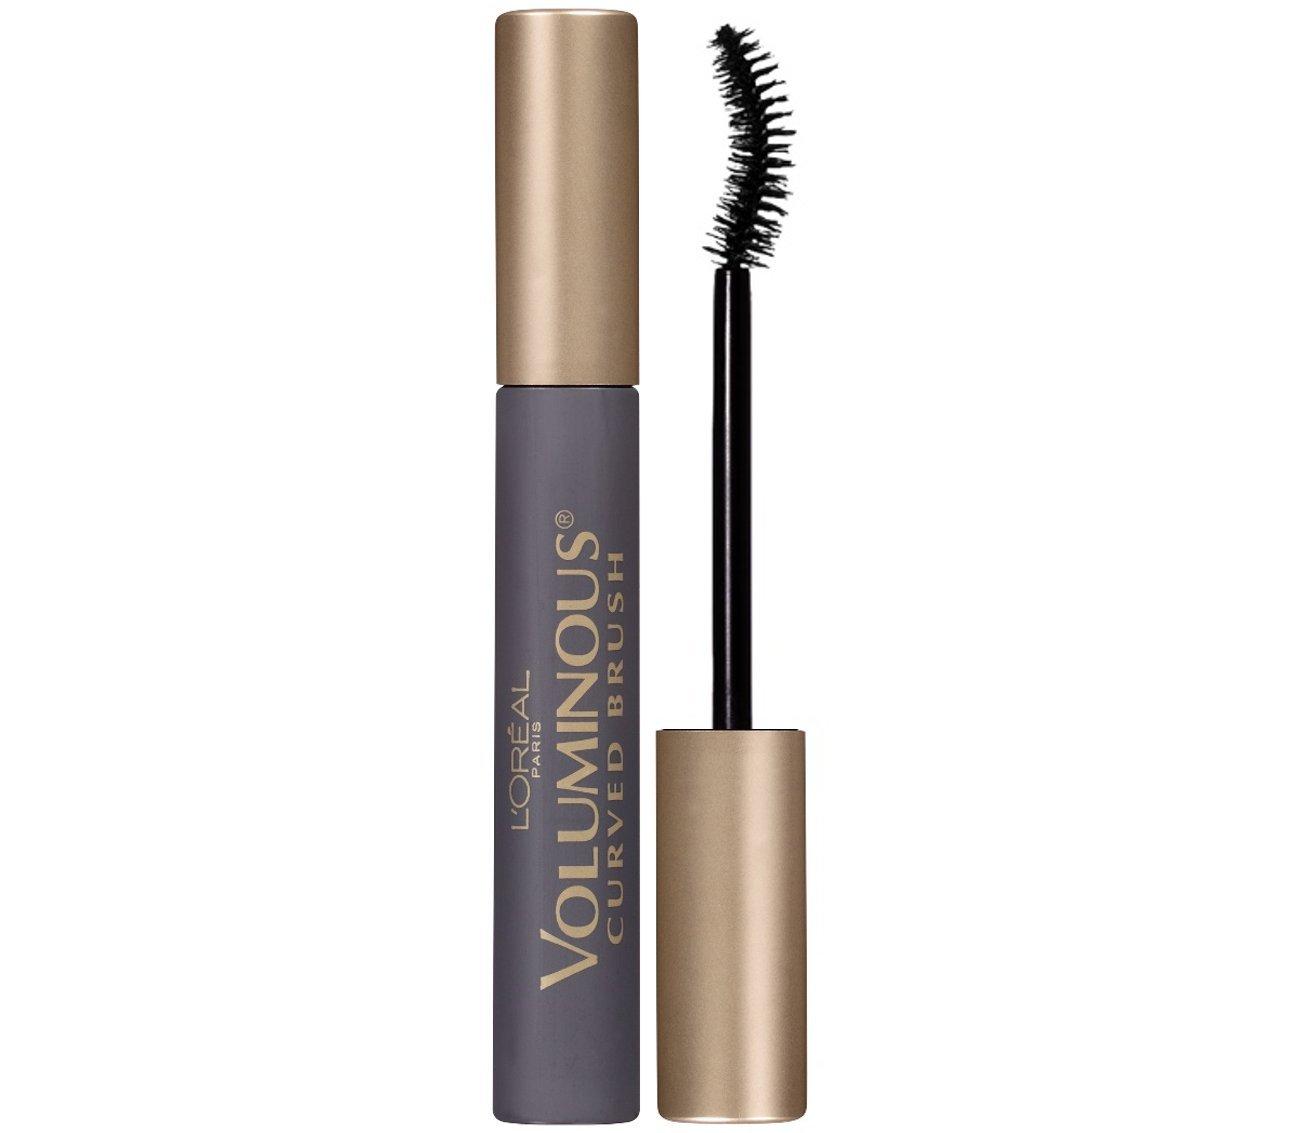 L'Oreal Paris Makeup Voluminous Original Volume Building Curved Brush Mascara, Black Brown, 0.28 fl. oz. L' Oreal Paris Cosmetics boi-opp-klo-uyi4080